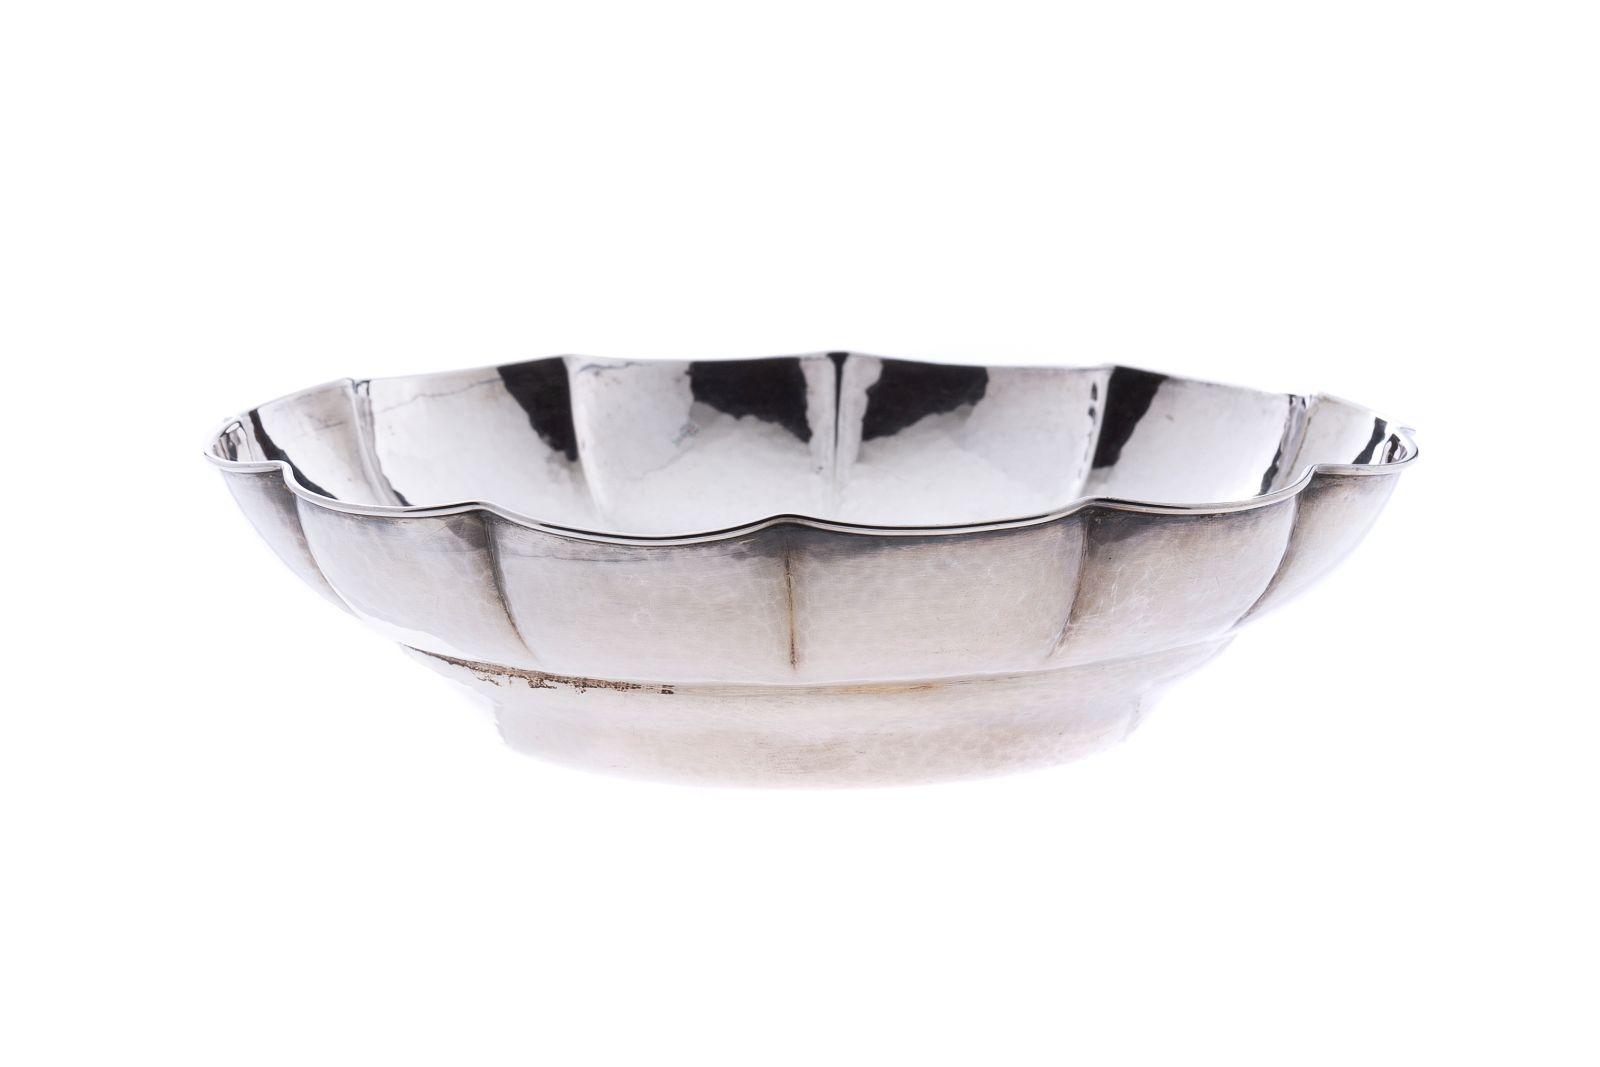 #120 Silver biscuit dish | Gebäckschale Image